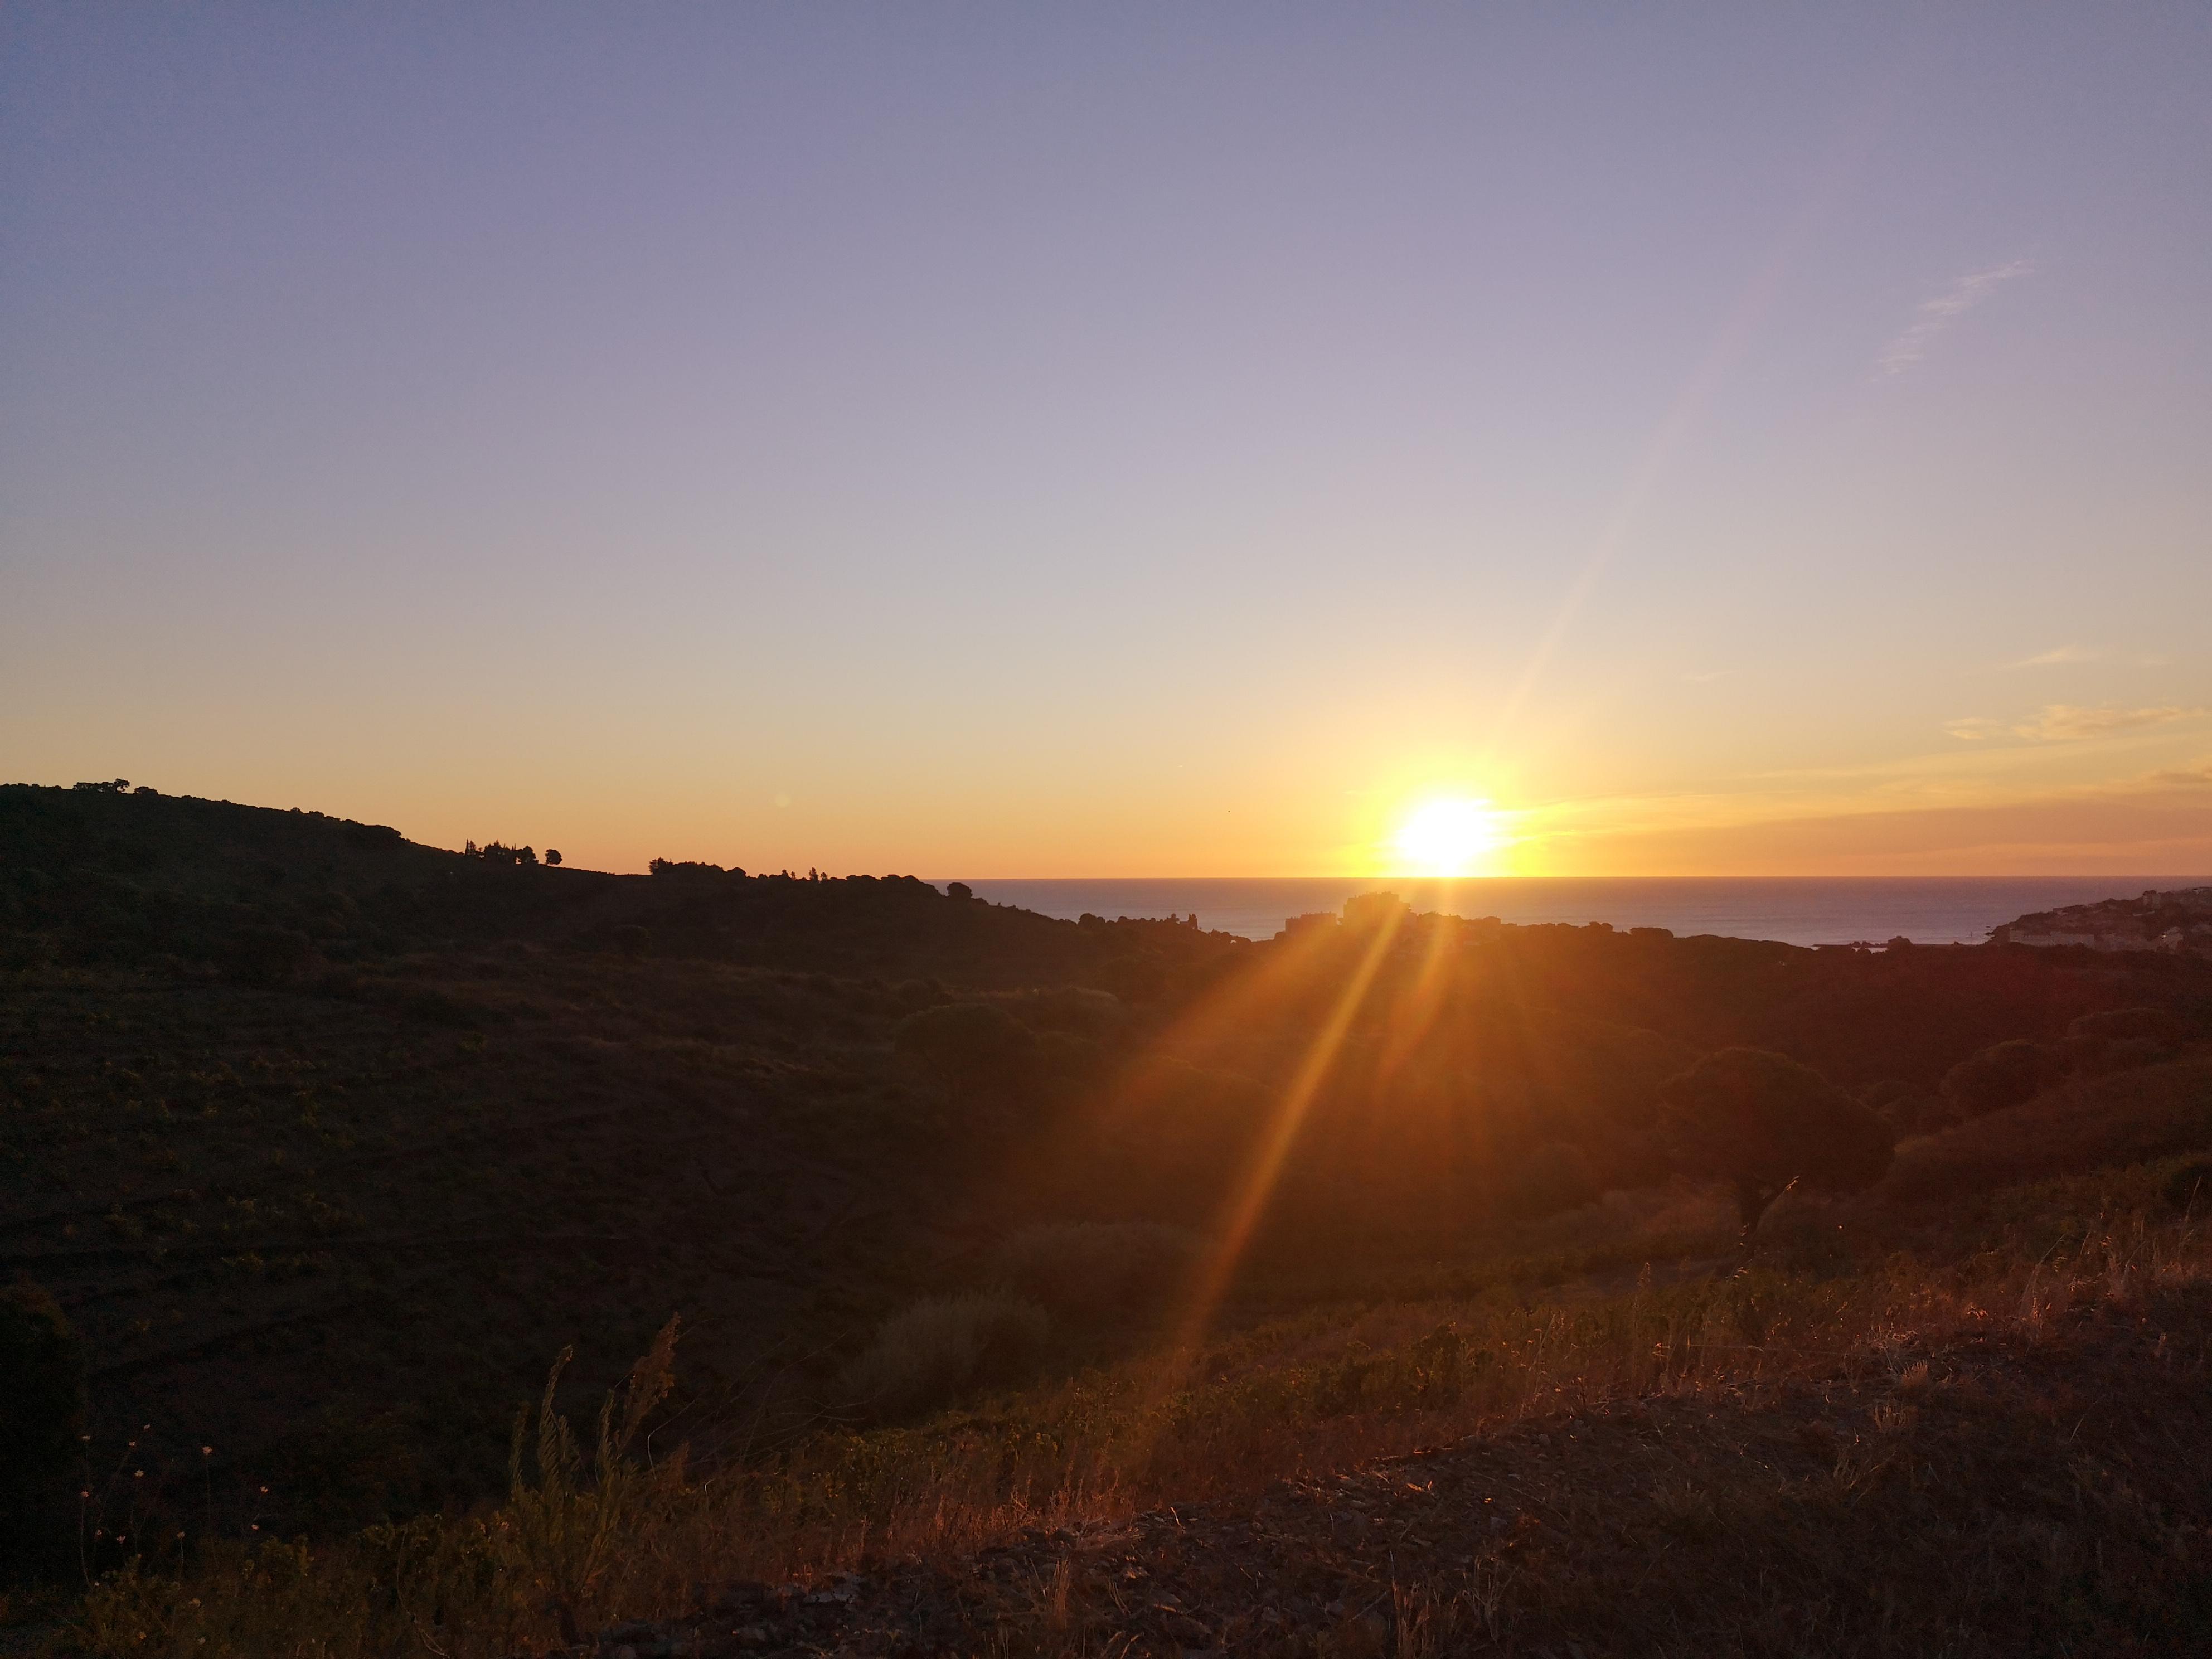 https://laroueetlaplume.fr/wp-content/uploads/2020/12/sunset.jpg